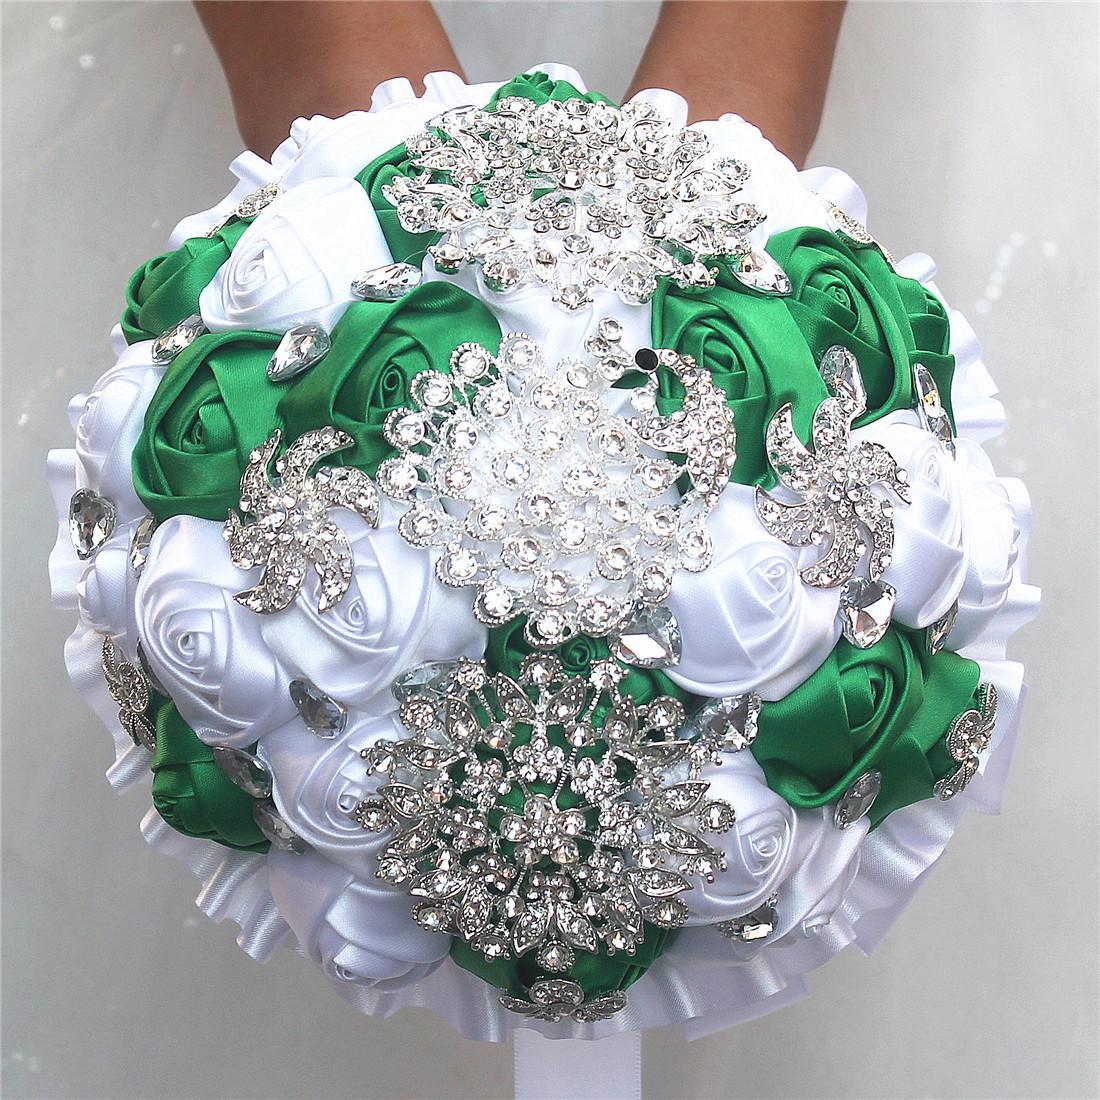 Bouquet Sposa Bianco E Verde.Acquista 18cm Cristallo Spilla Bouquet Da Sposa Bianco E Verde